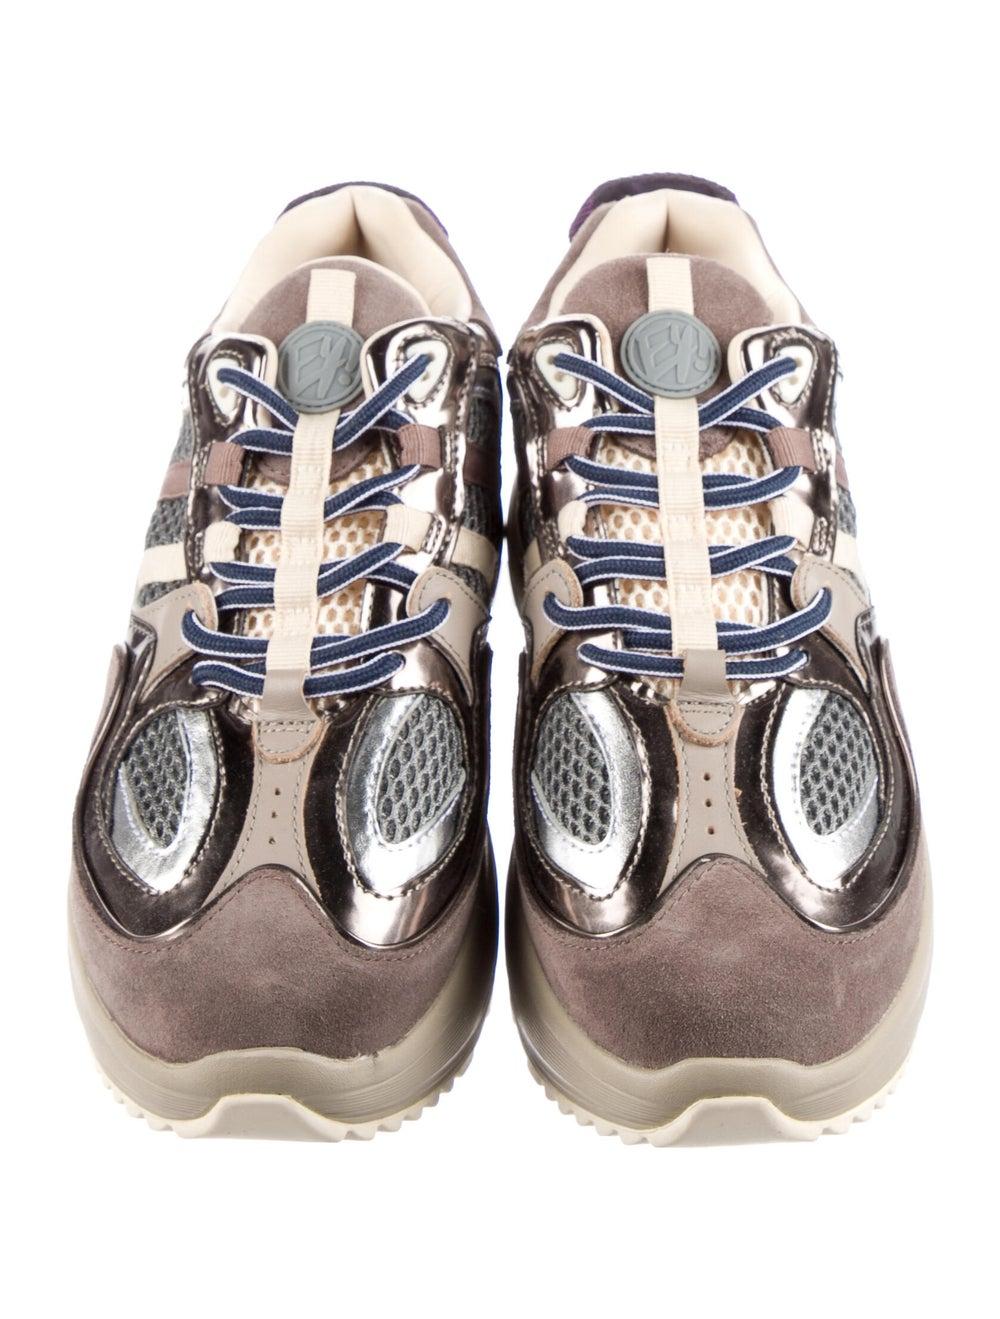 Eytys Jet Iron Sneakers - image 3